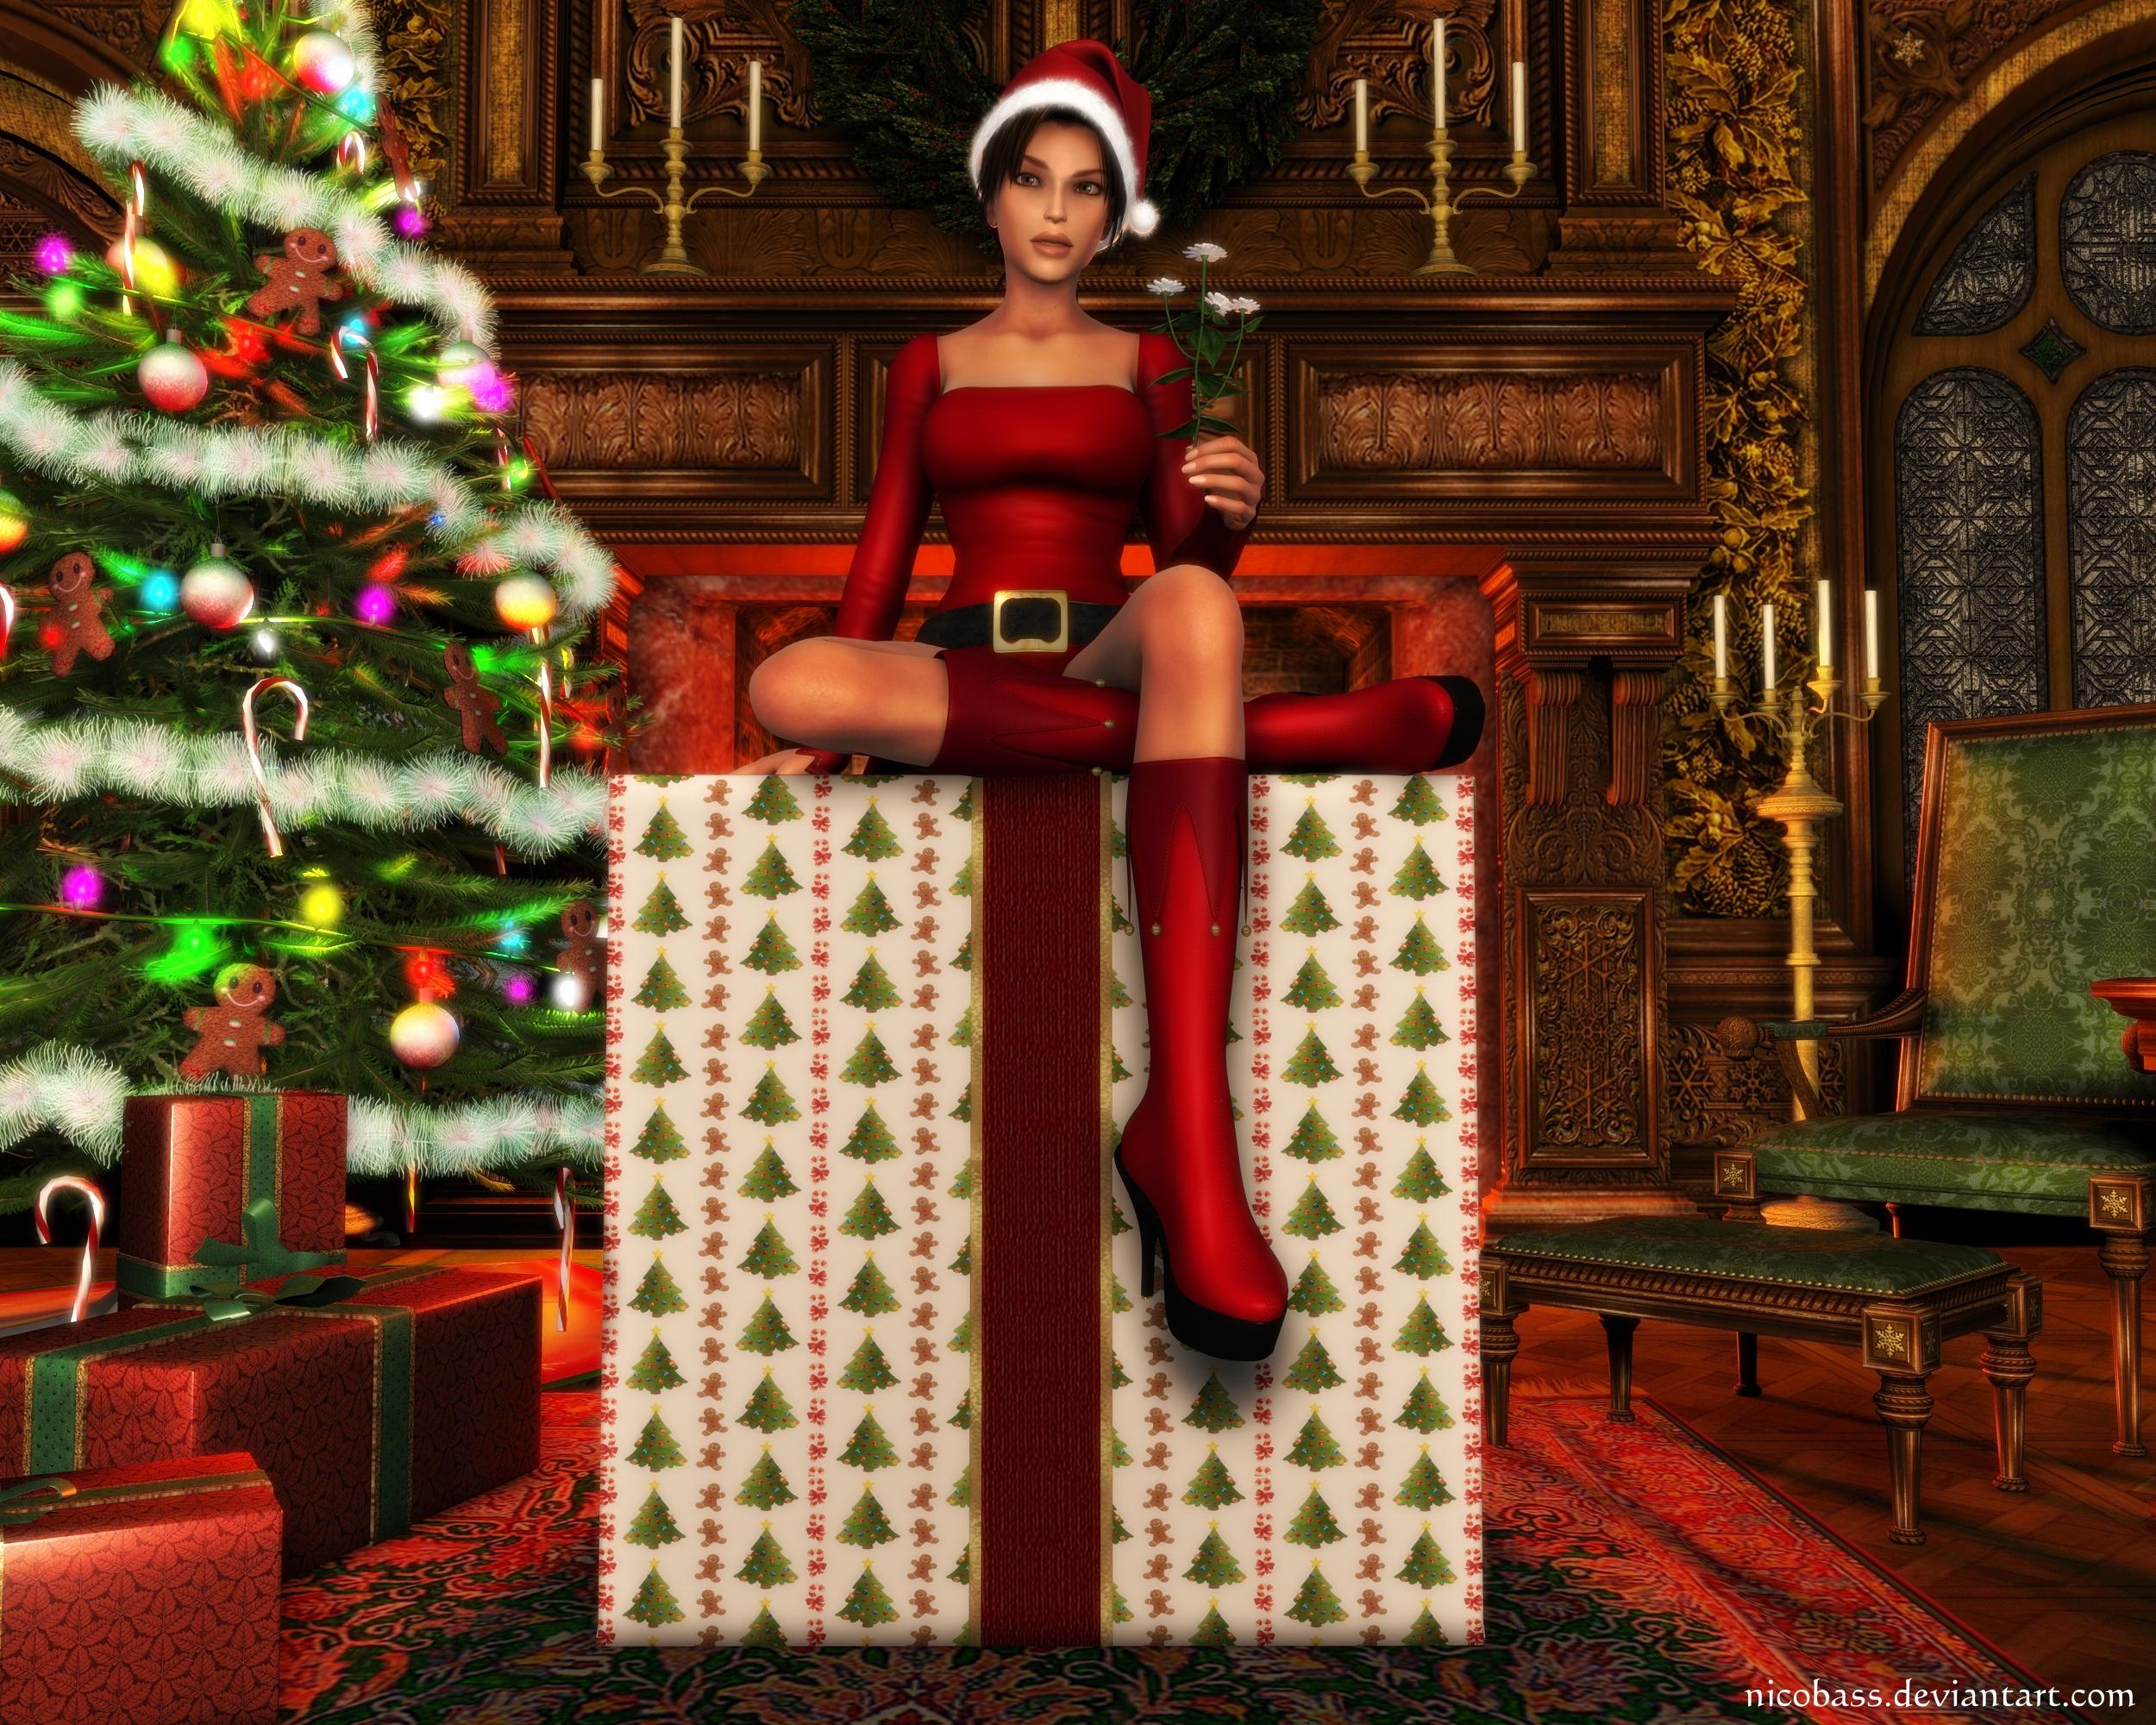 http://fc00.deviantart.net/fs71/f/2009/358/6/6/Lara_Croft_76_by_Nicobass.jpg